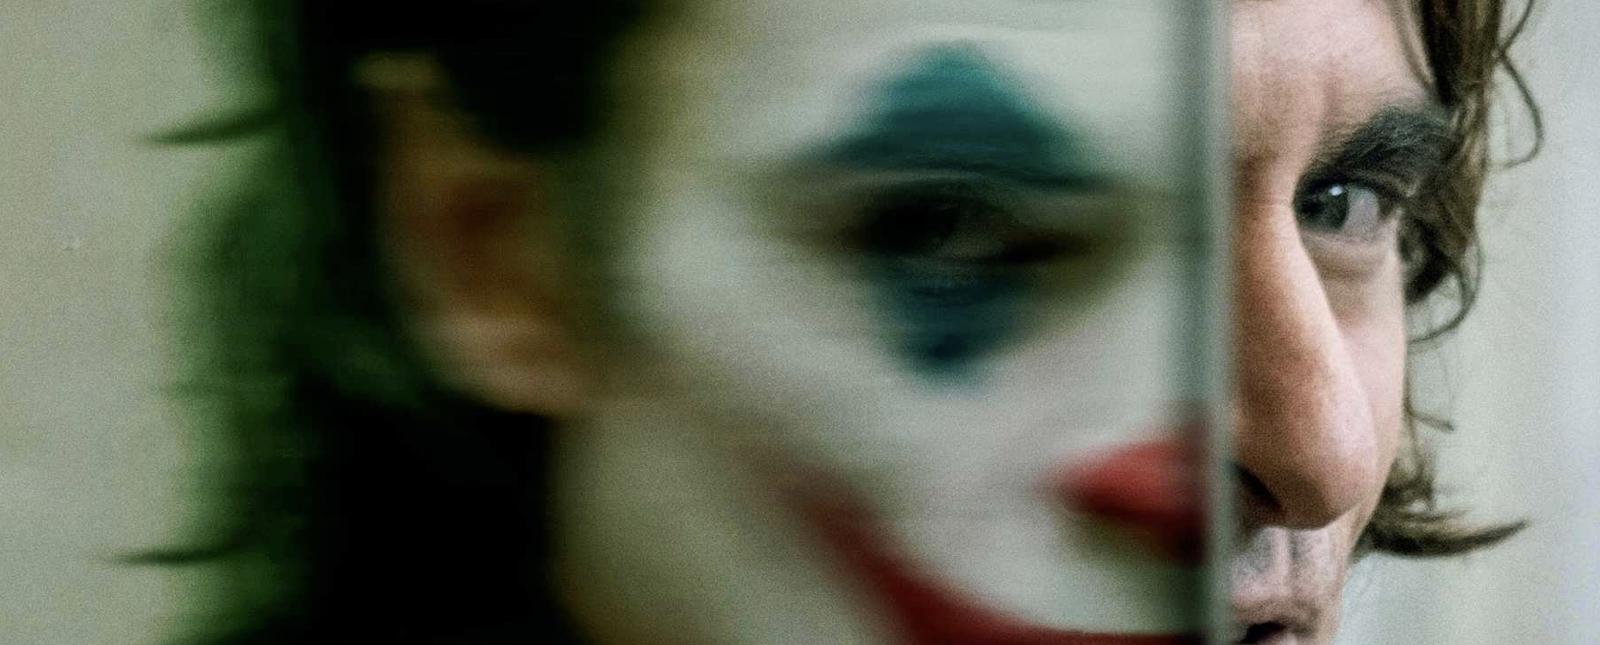 joker-la-pelicula-no-se-basara-en-los-comics